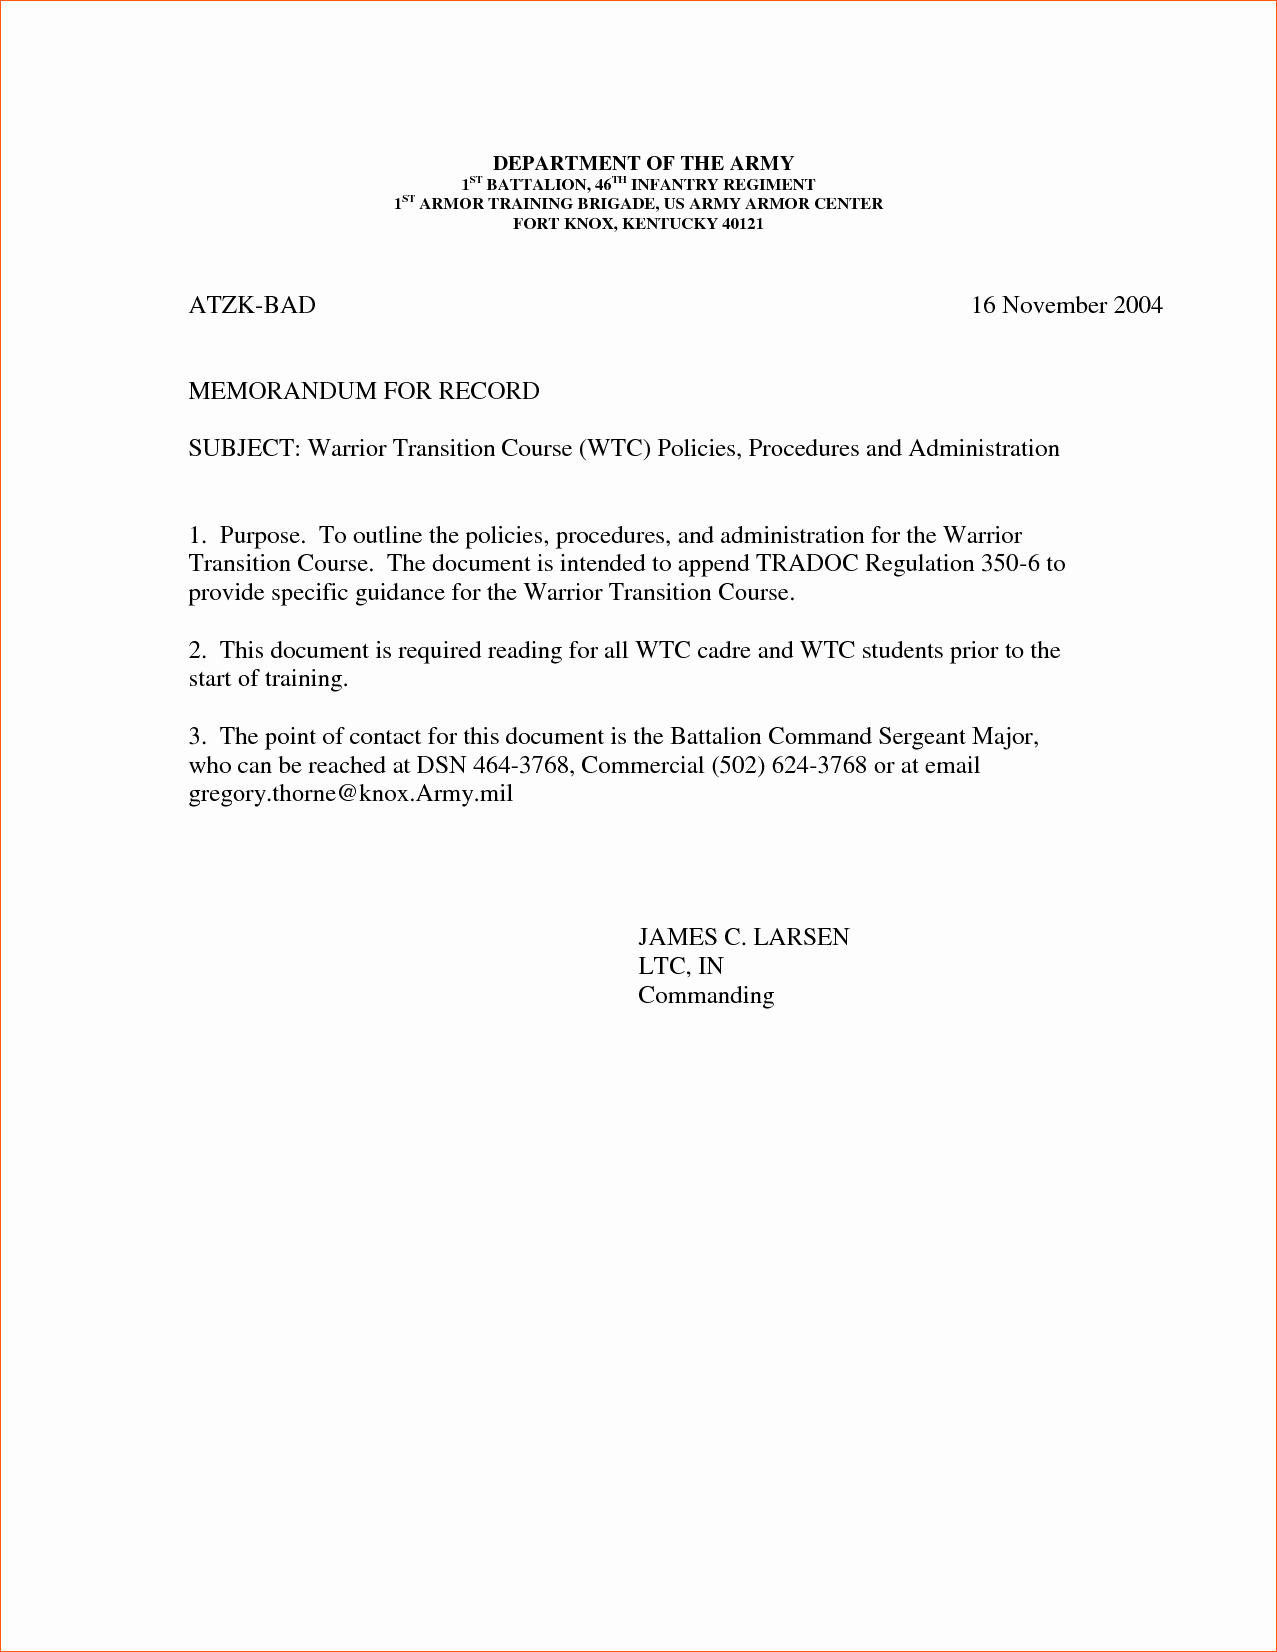 Memorandum Of Record Template Luxury 6 Memorandum for Record Example